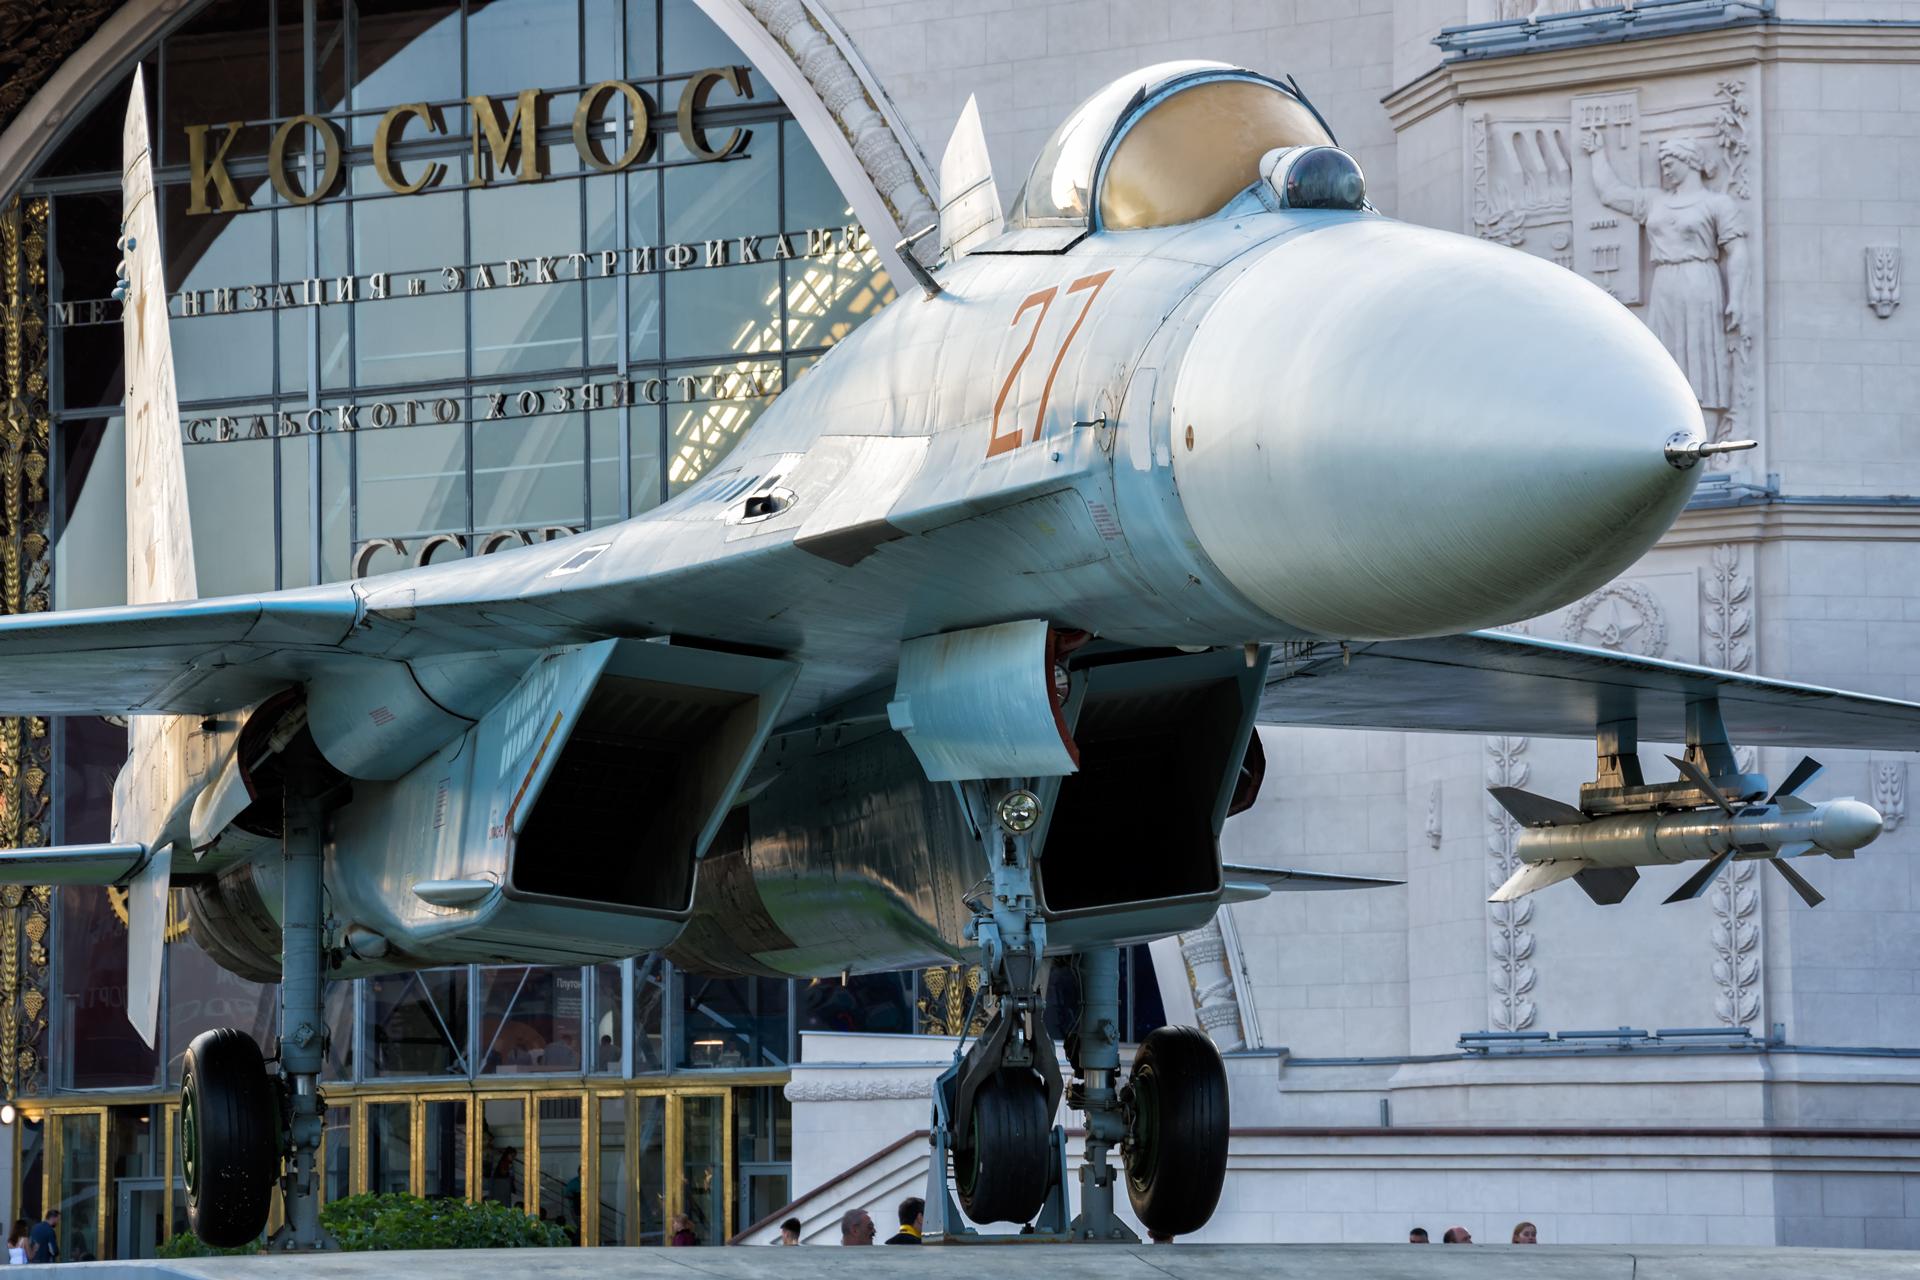 Moskwa – Planespotting Trip (Dzień 4.)